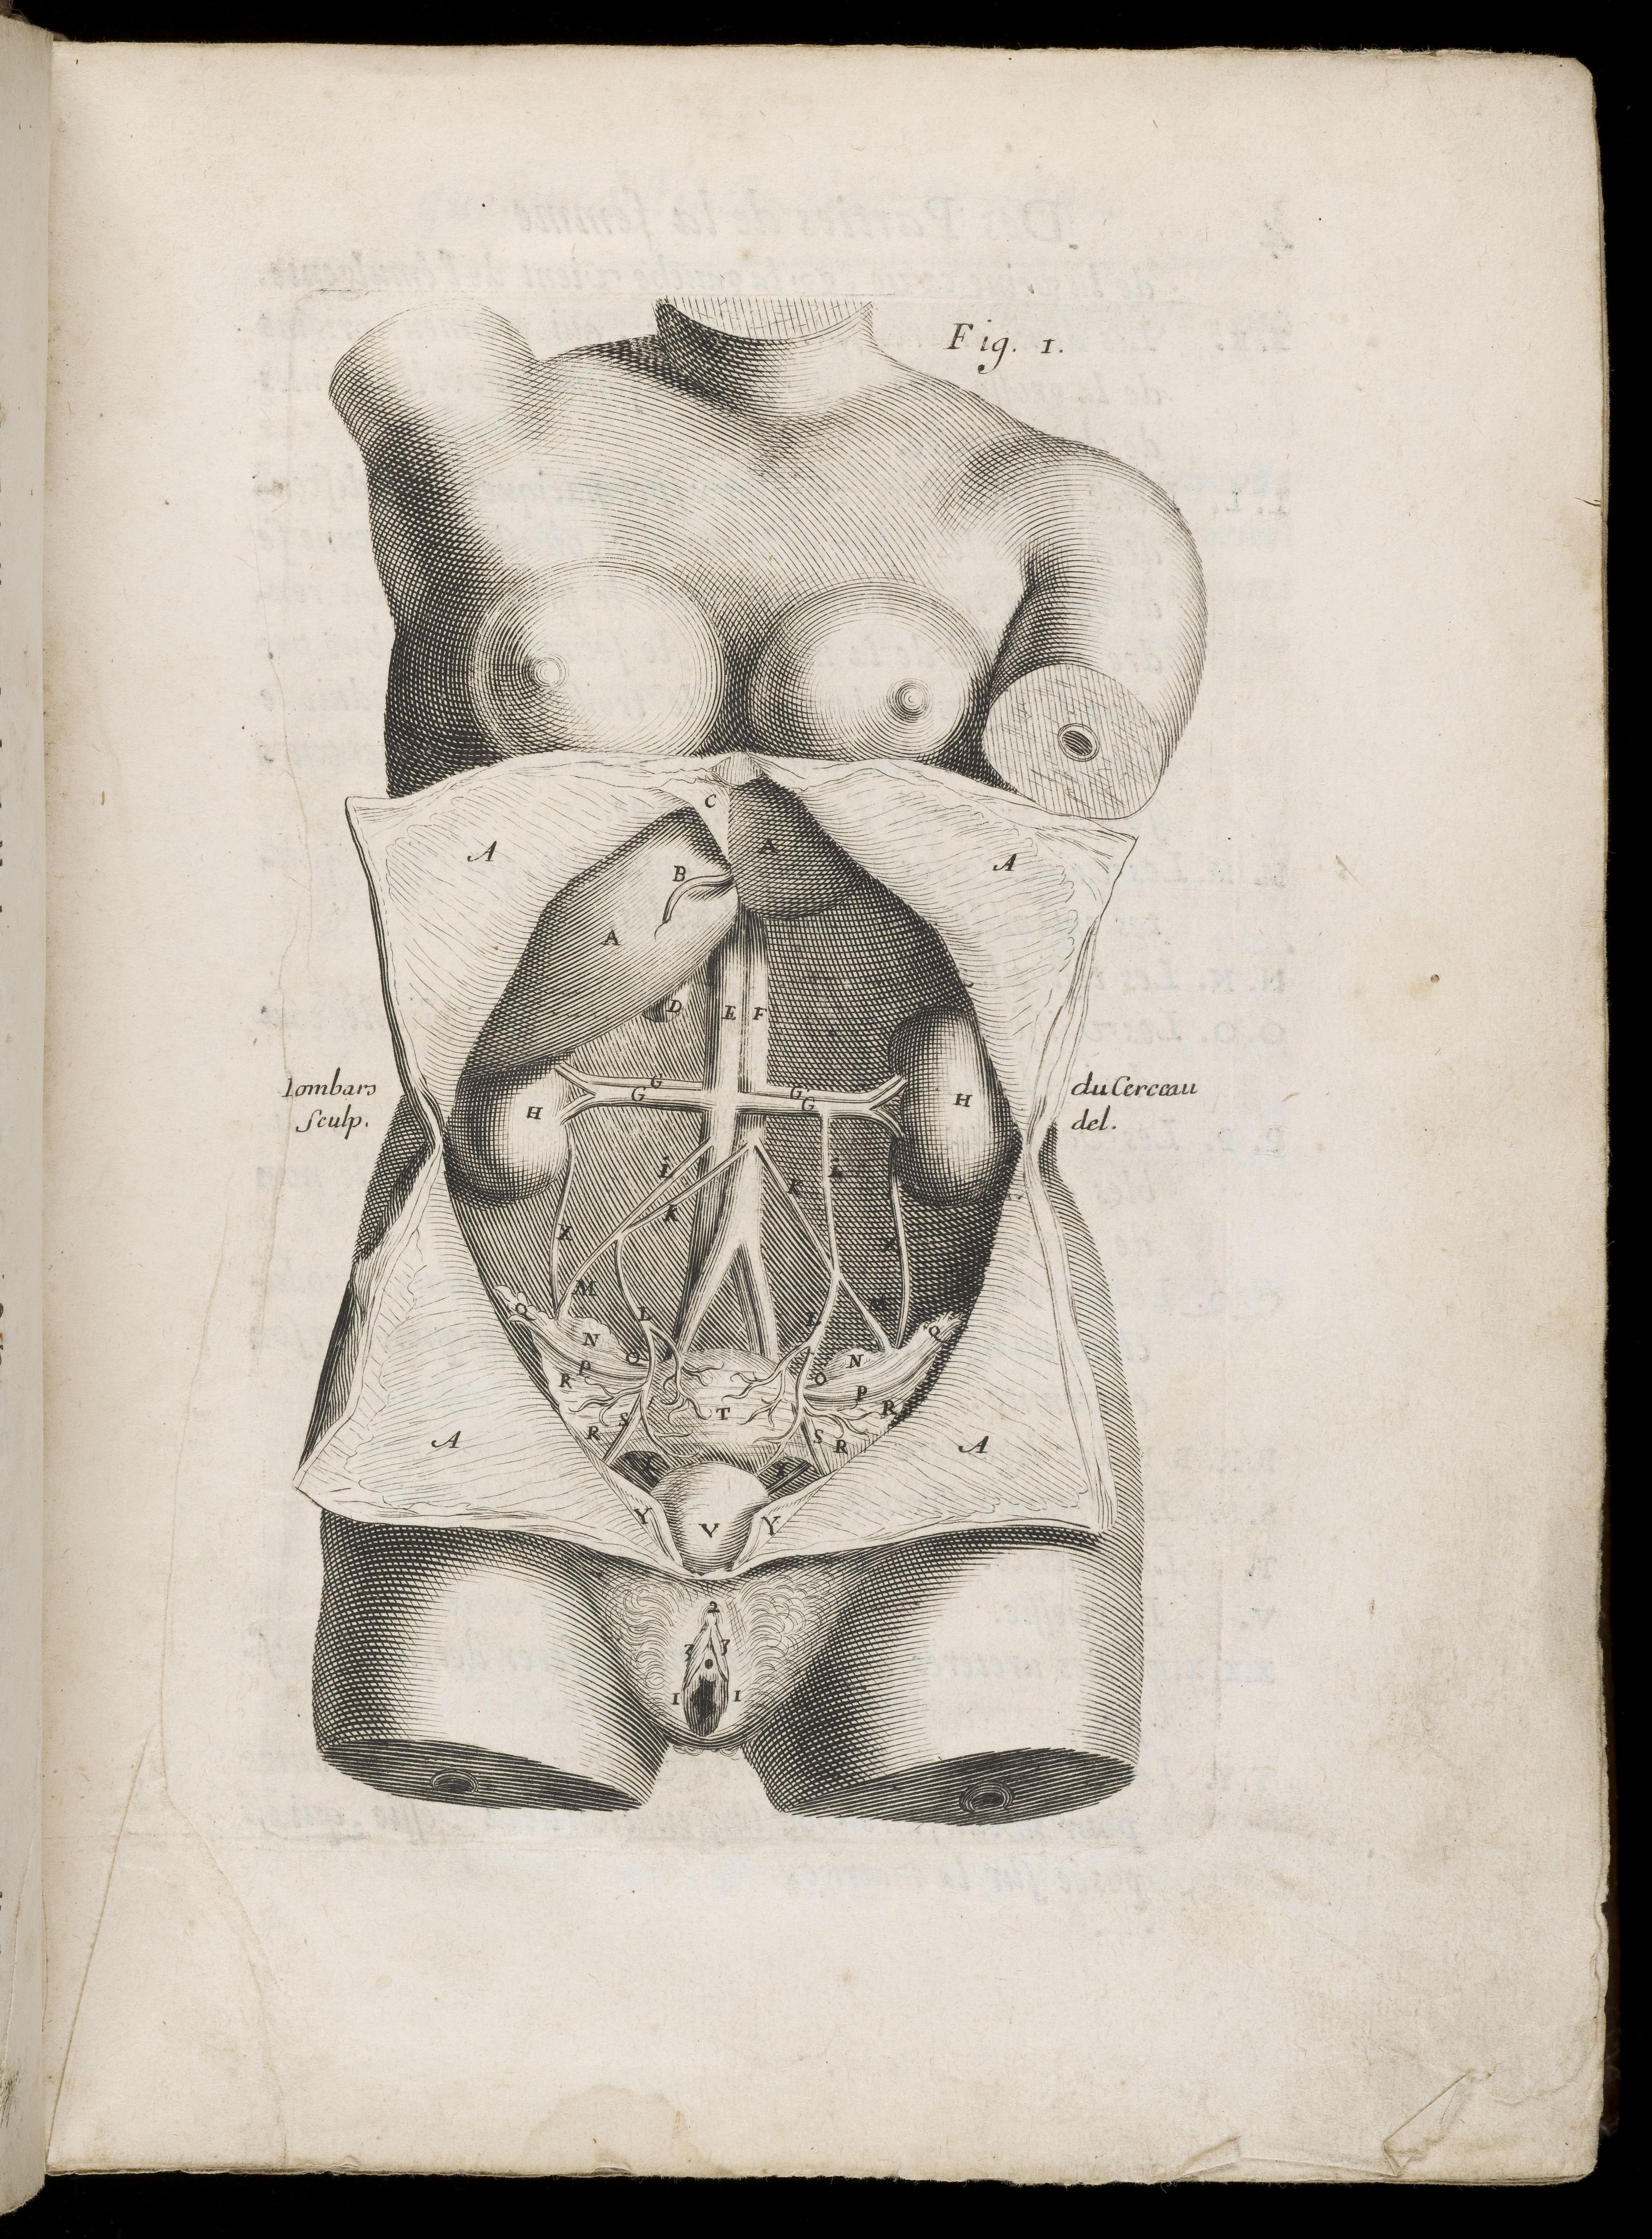 Filediagram Of Female Internal Organs Including Kidneys Liver